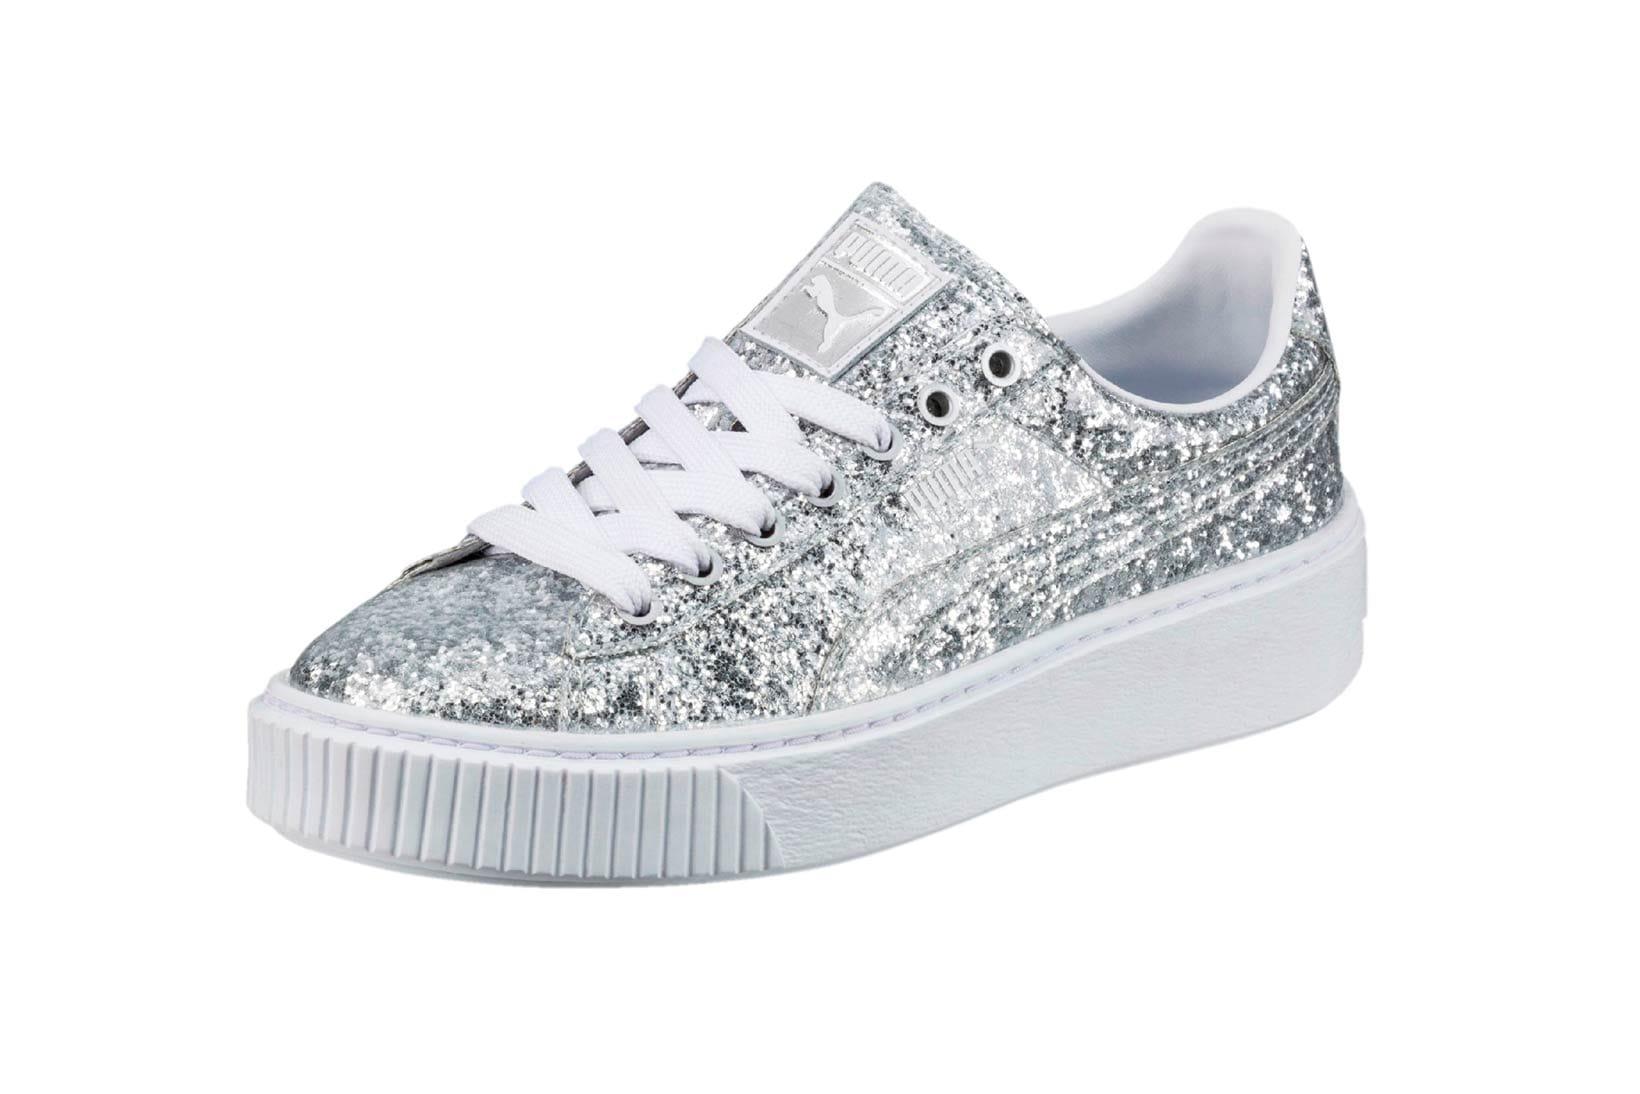 PUMA Basket Platform Glitter in Silver